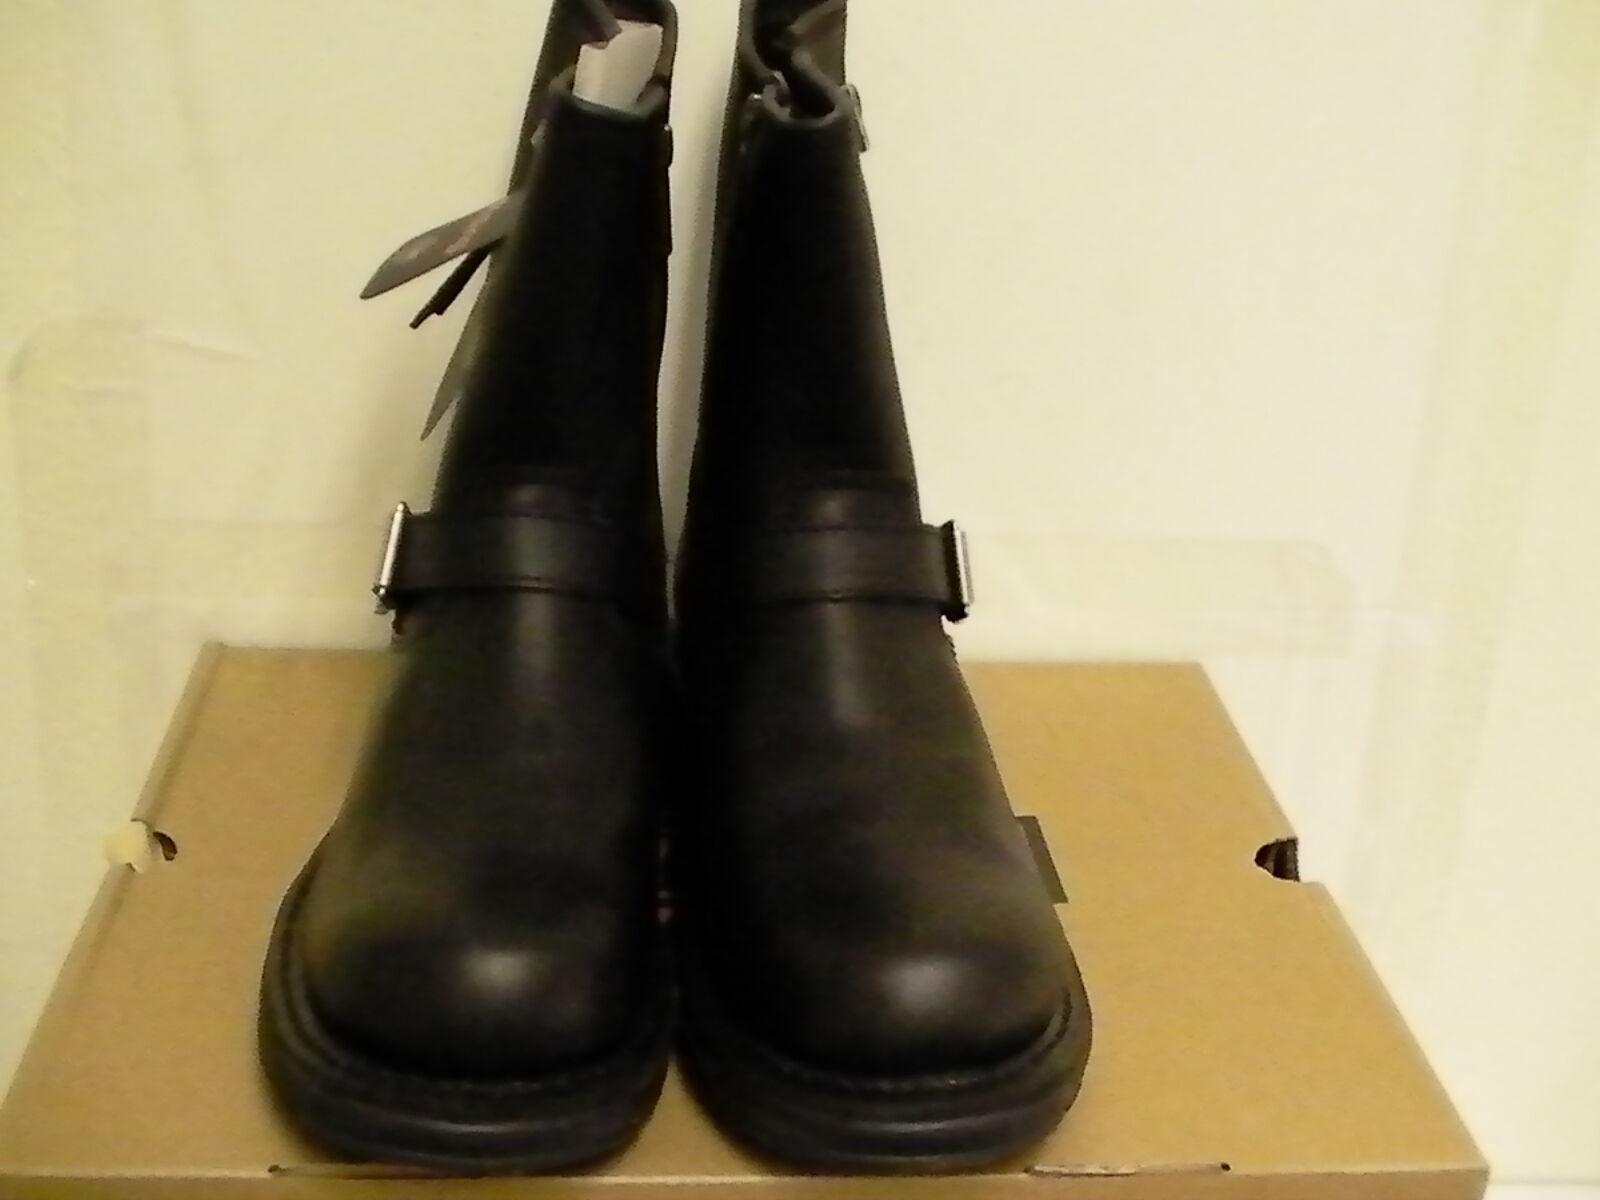 Harley davidson boots montrose 2 BKL engineer size 7.5 Uomo us